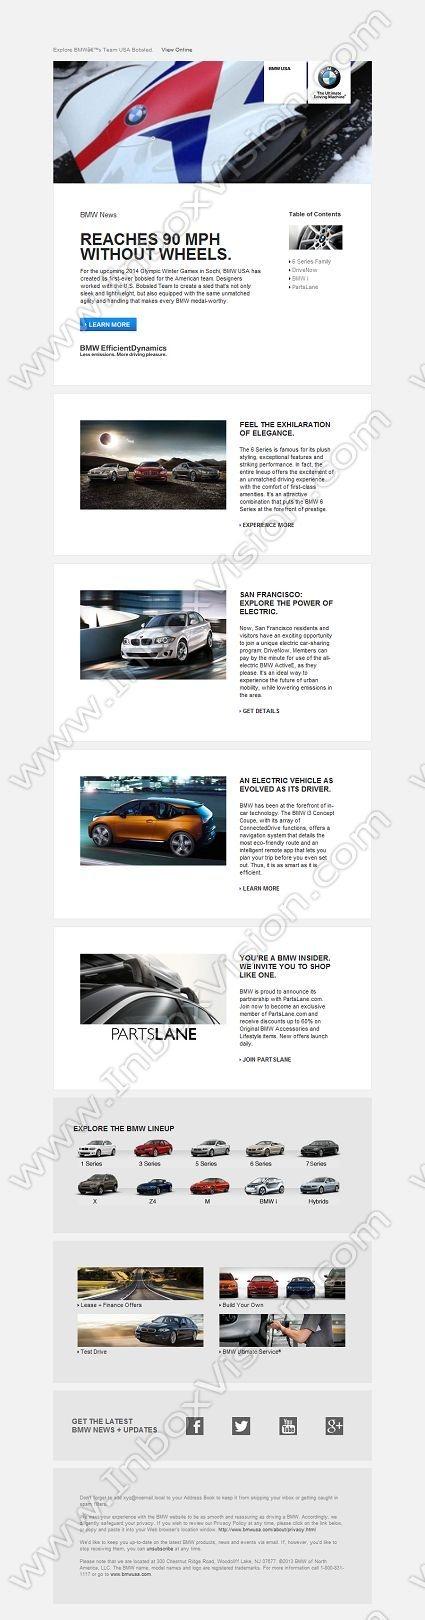 BMW inspirational email design